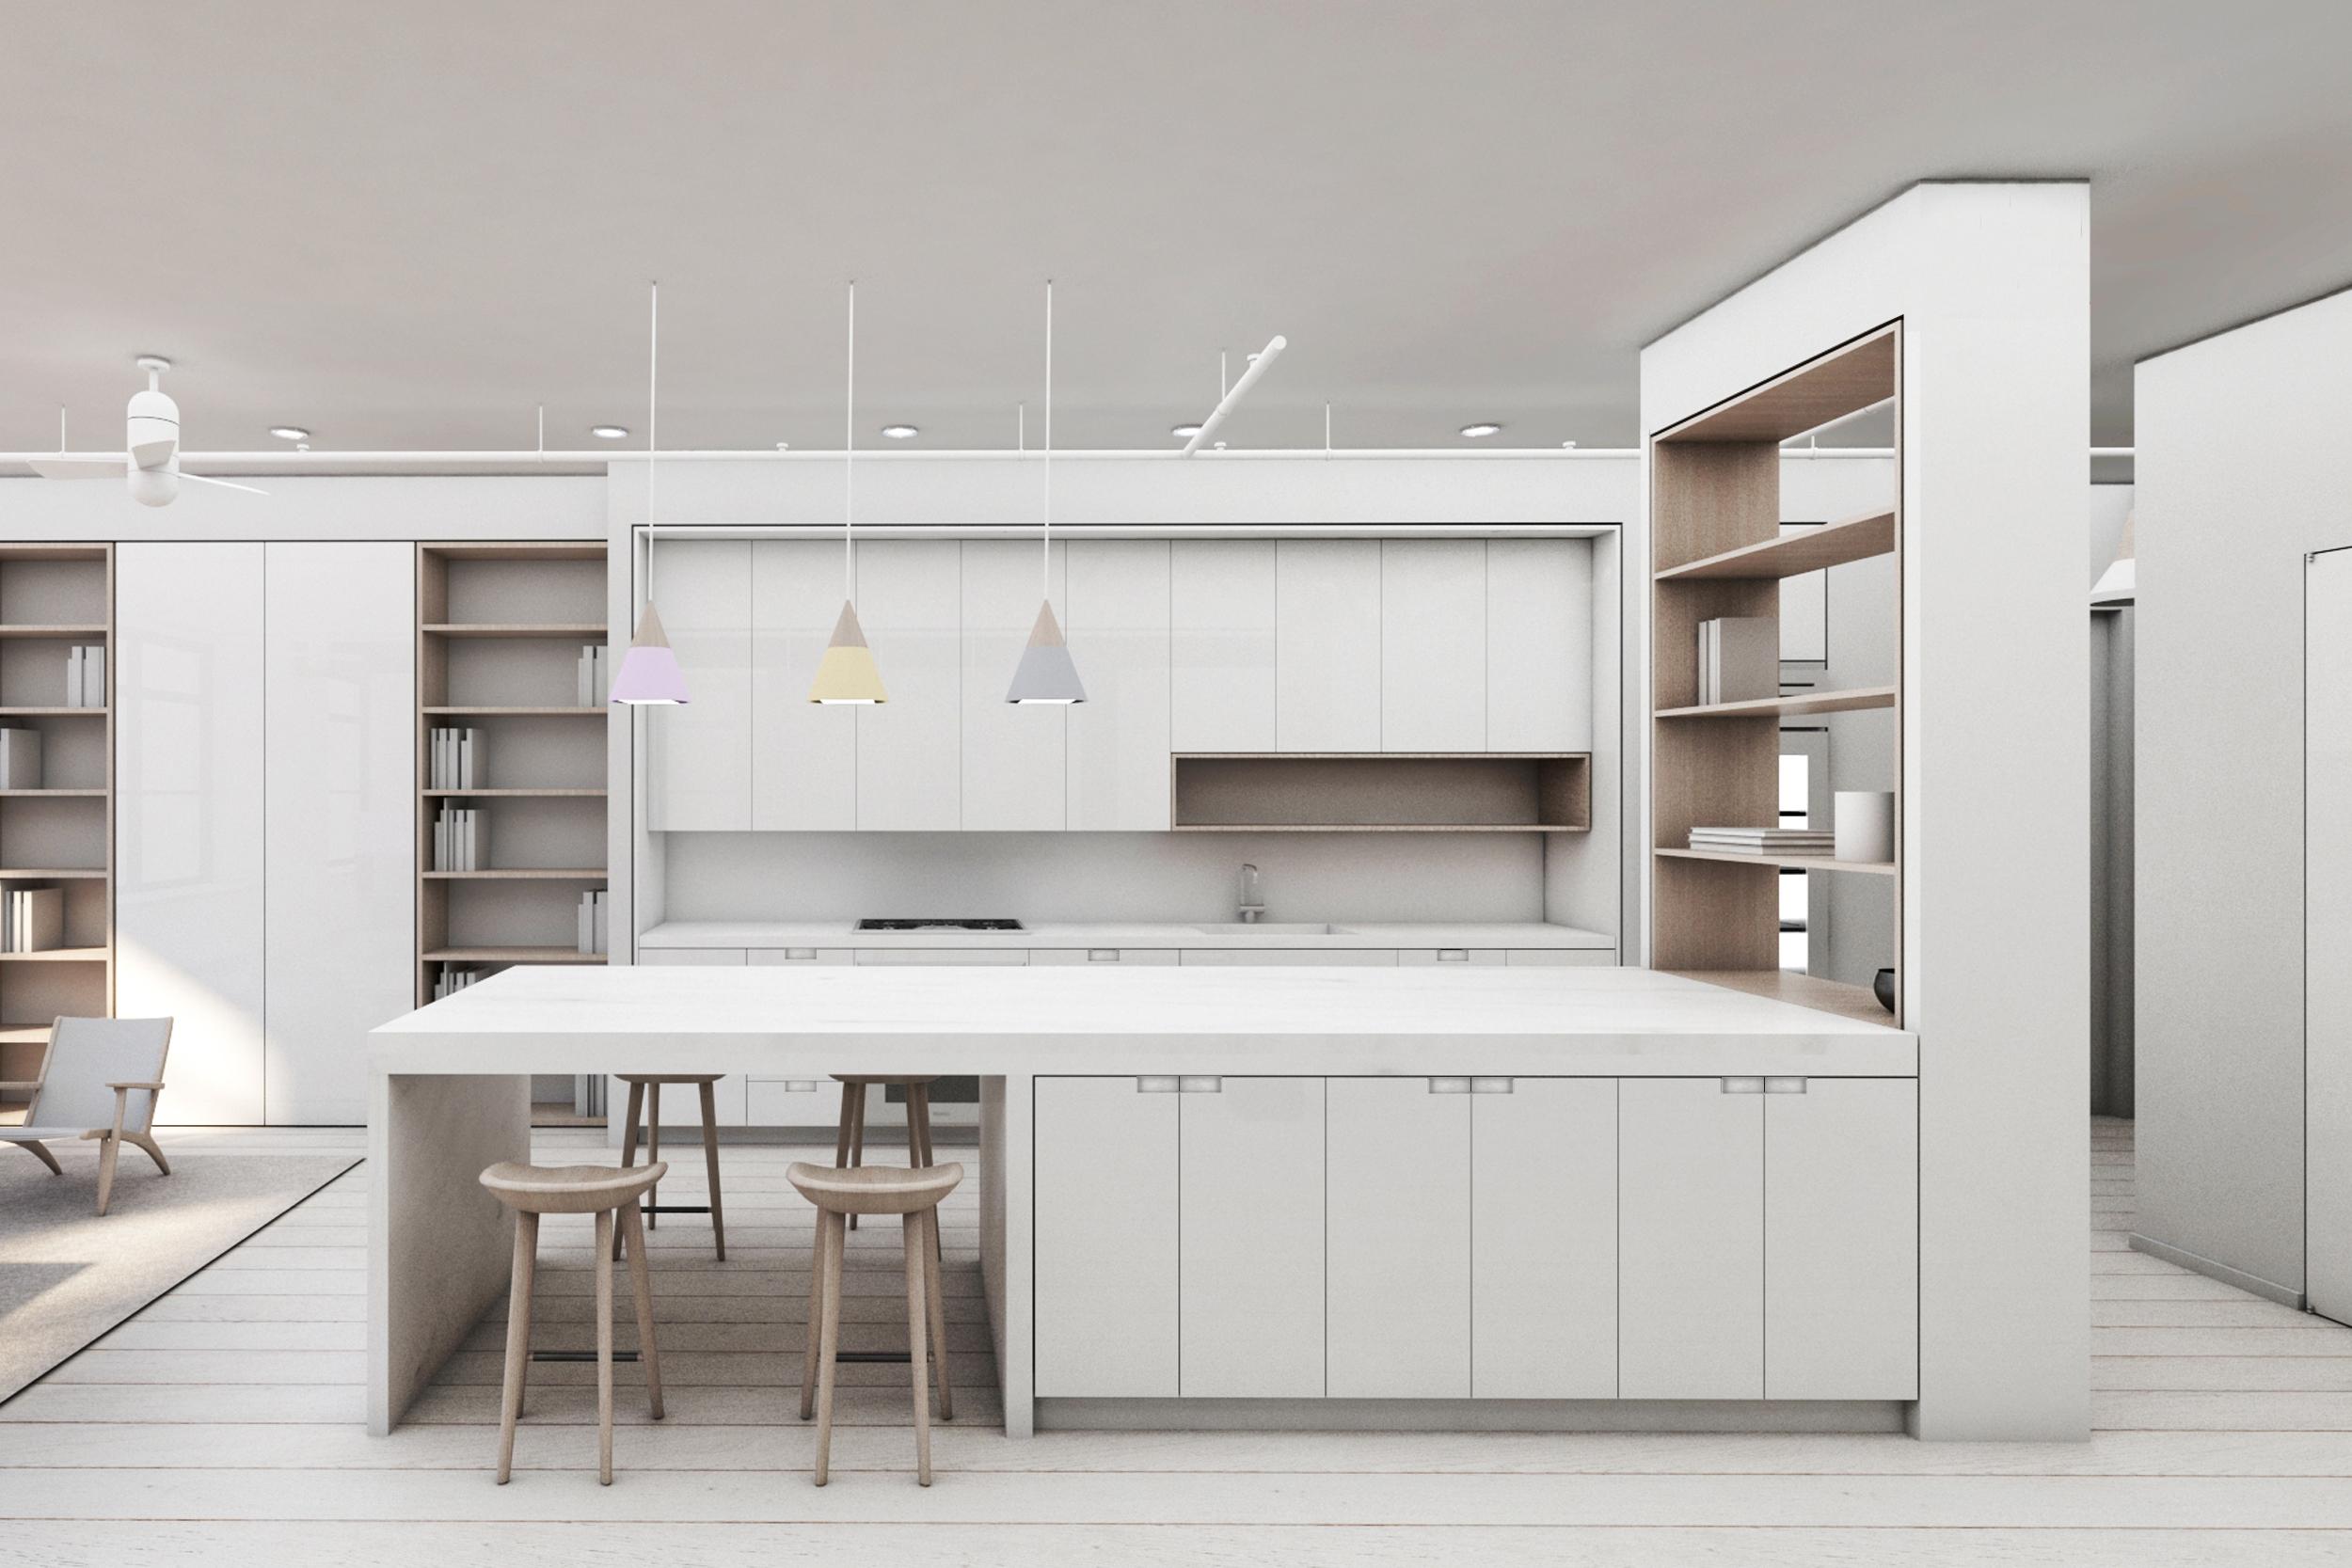 long kitchen_001.jpg